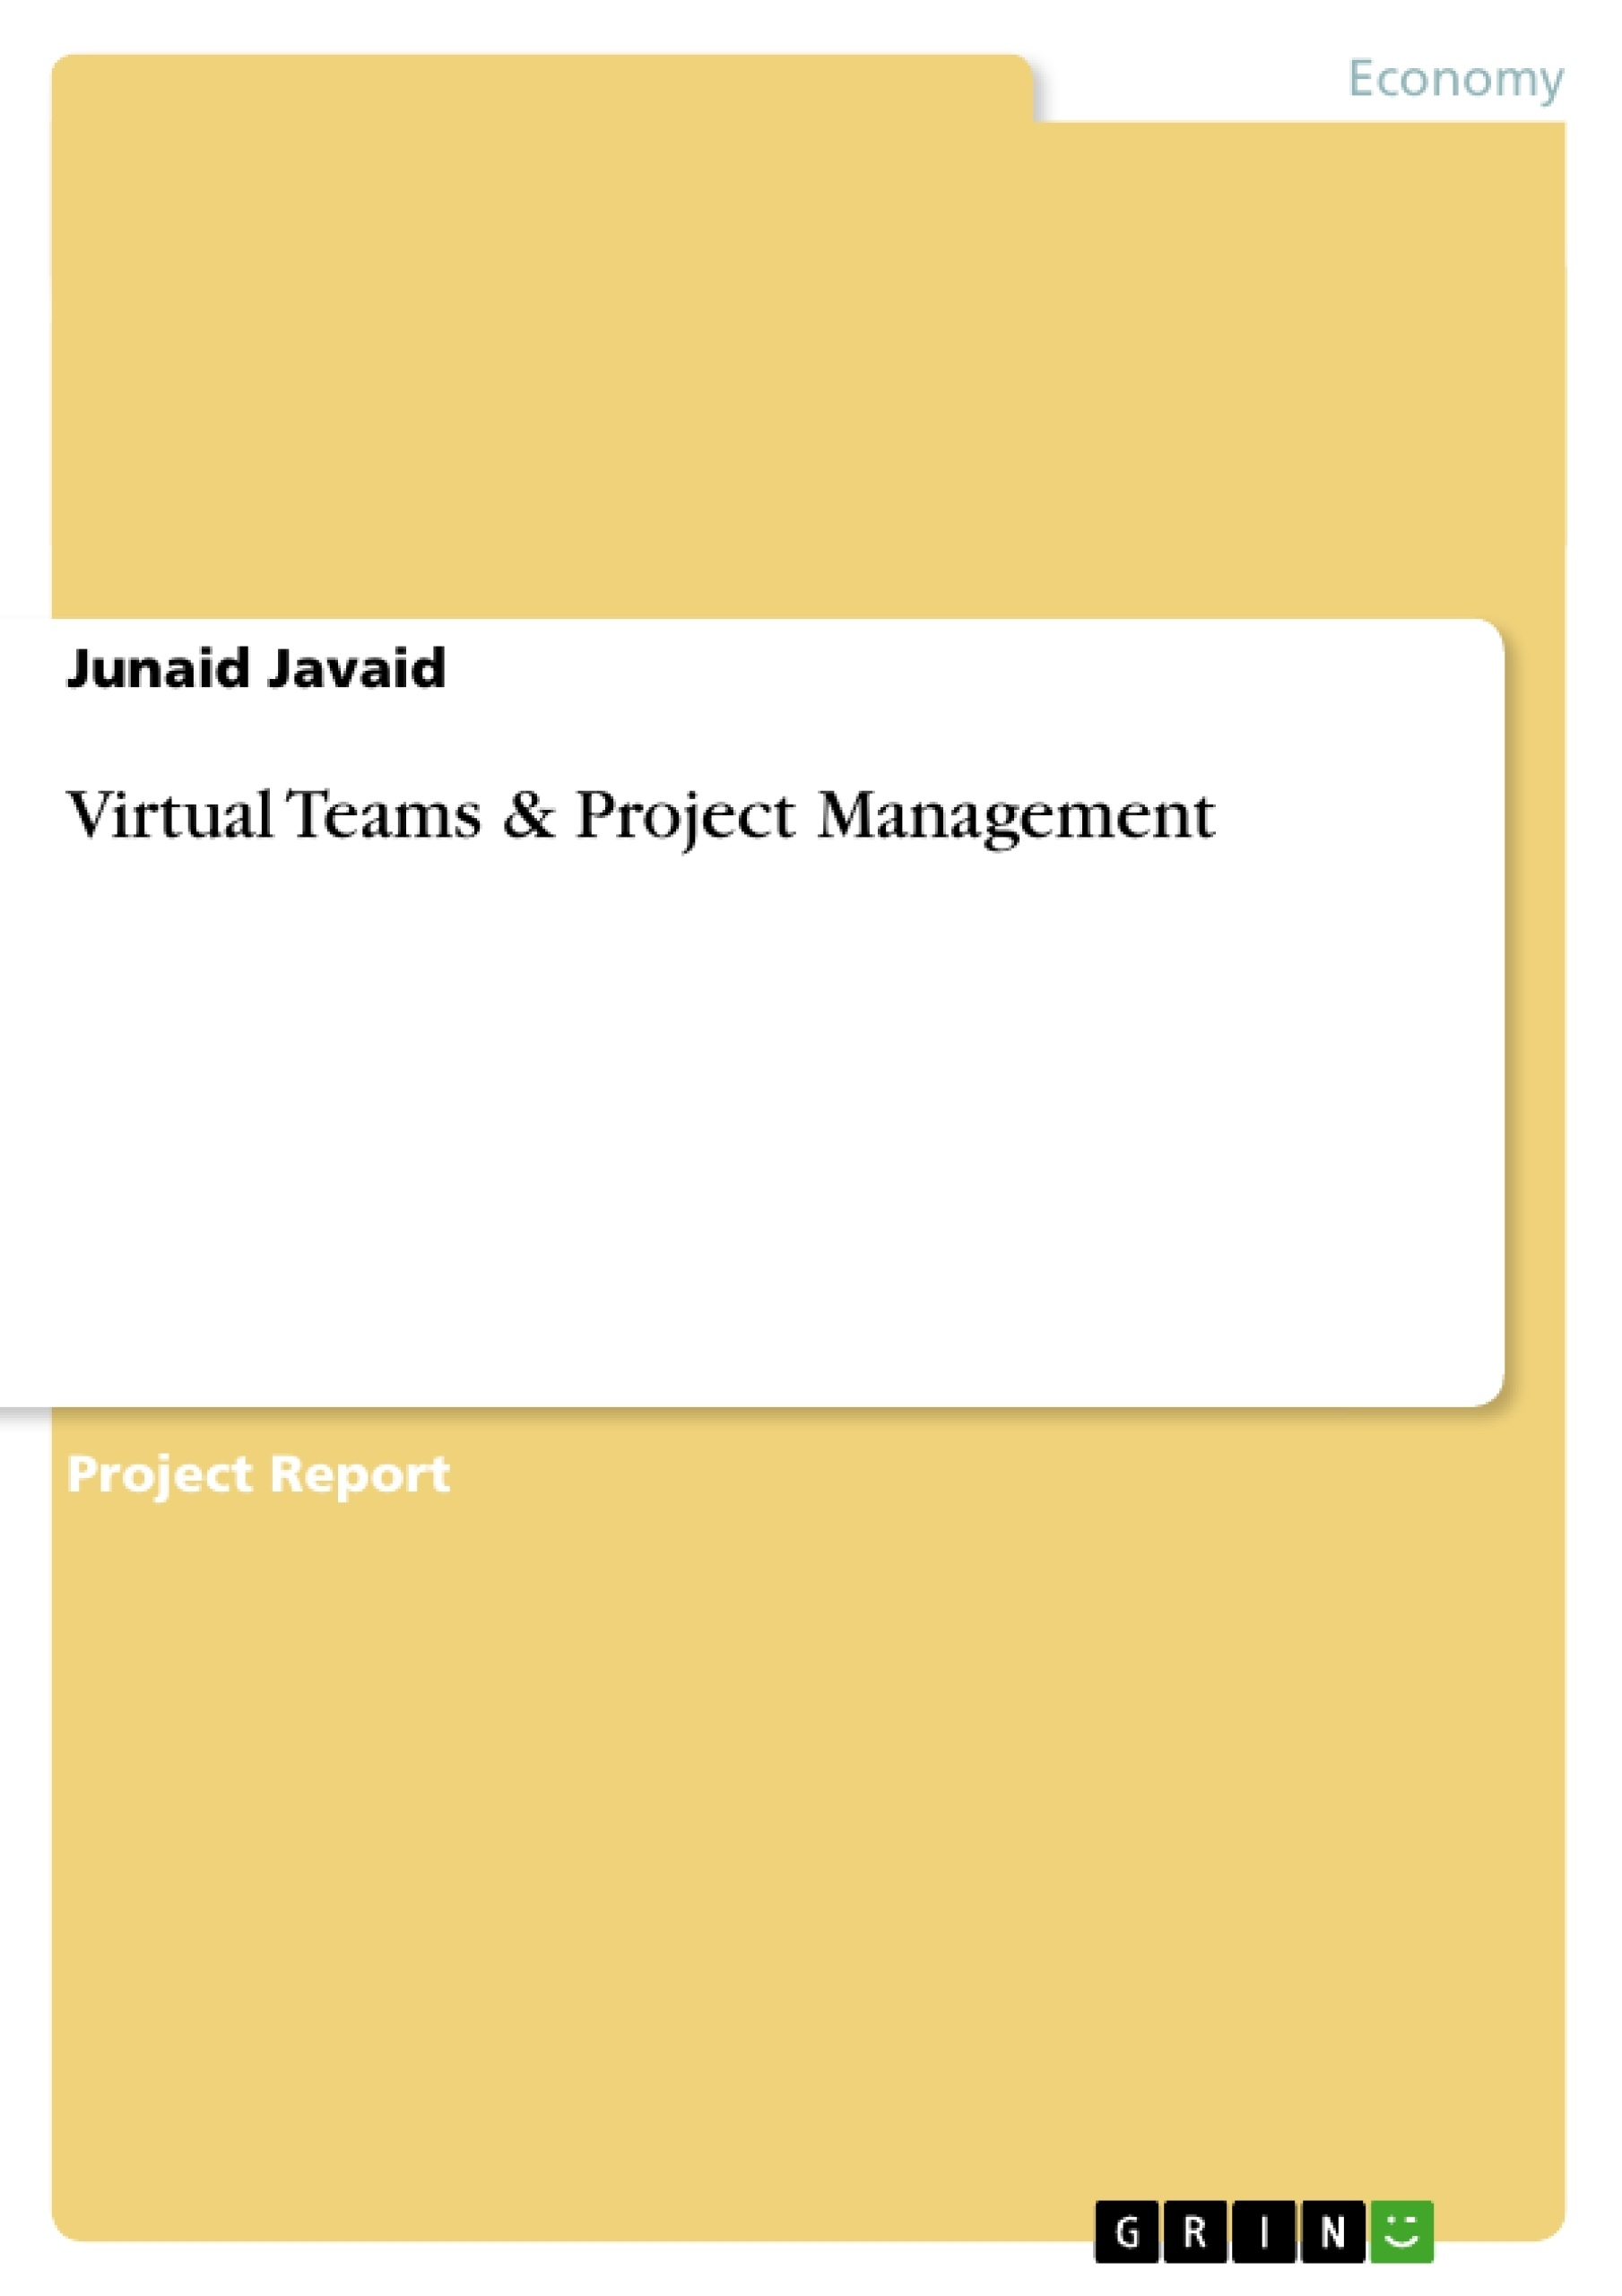 Title: Virtual Teams & Project Management